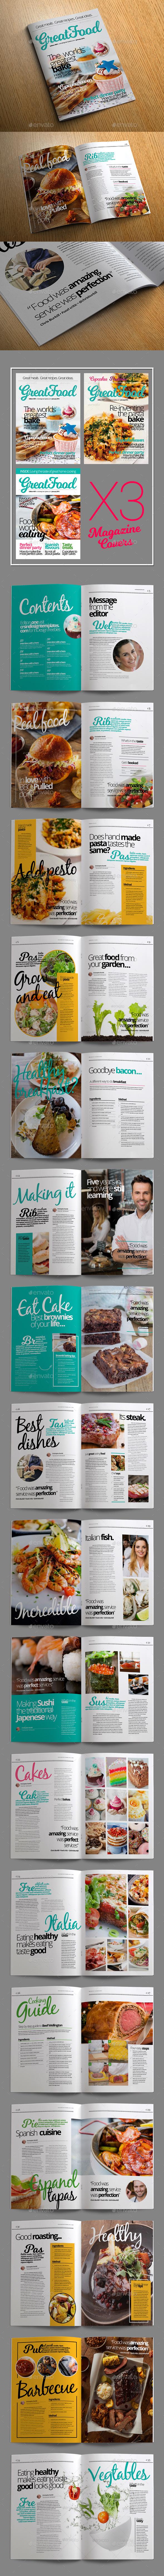 Food Magazine Templates - Magazines Print Templates